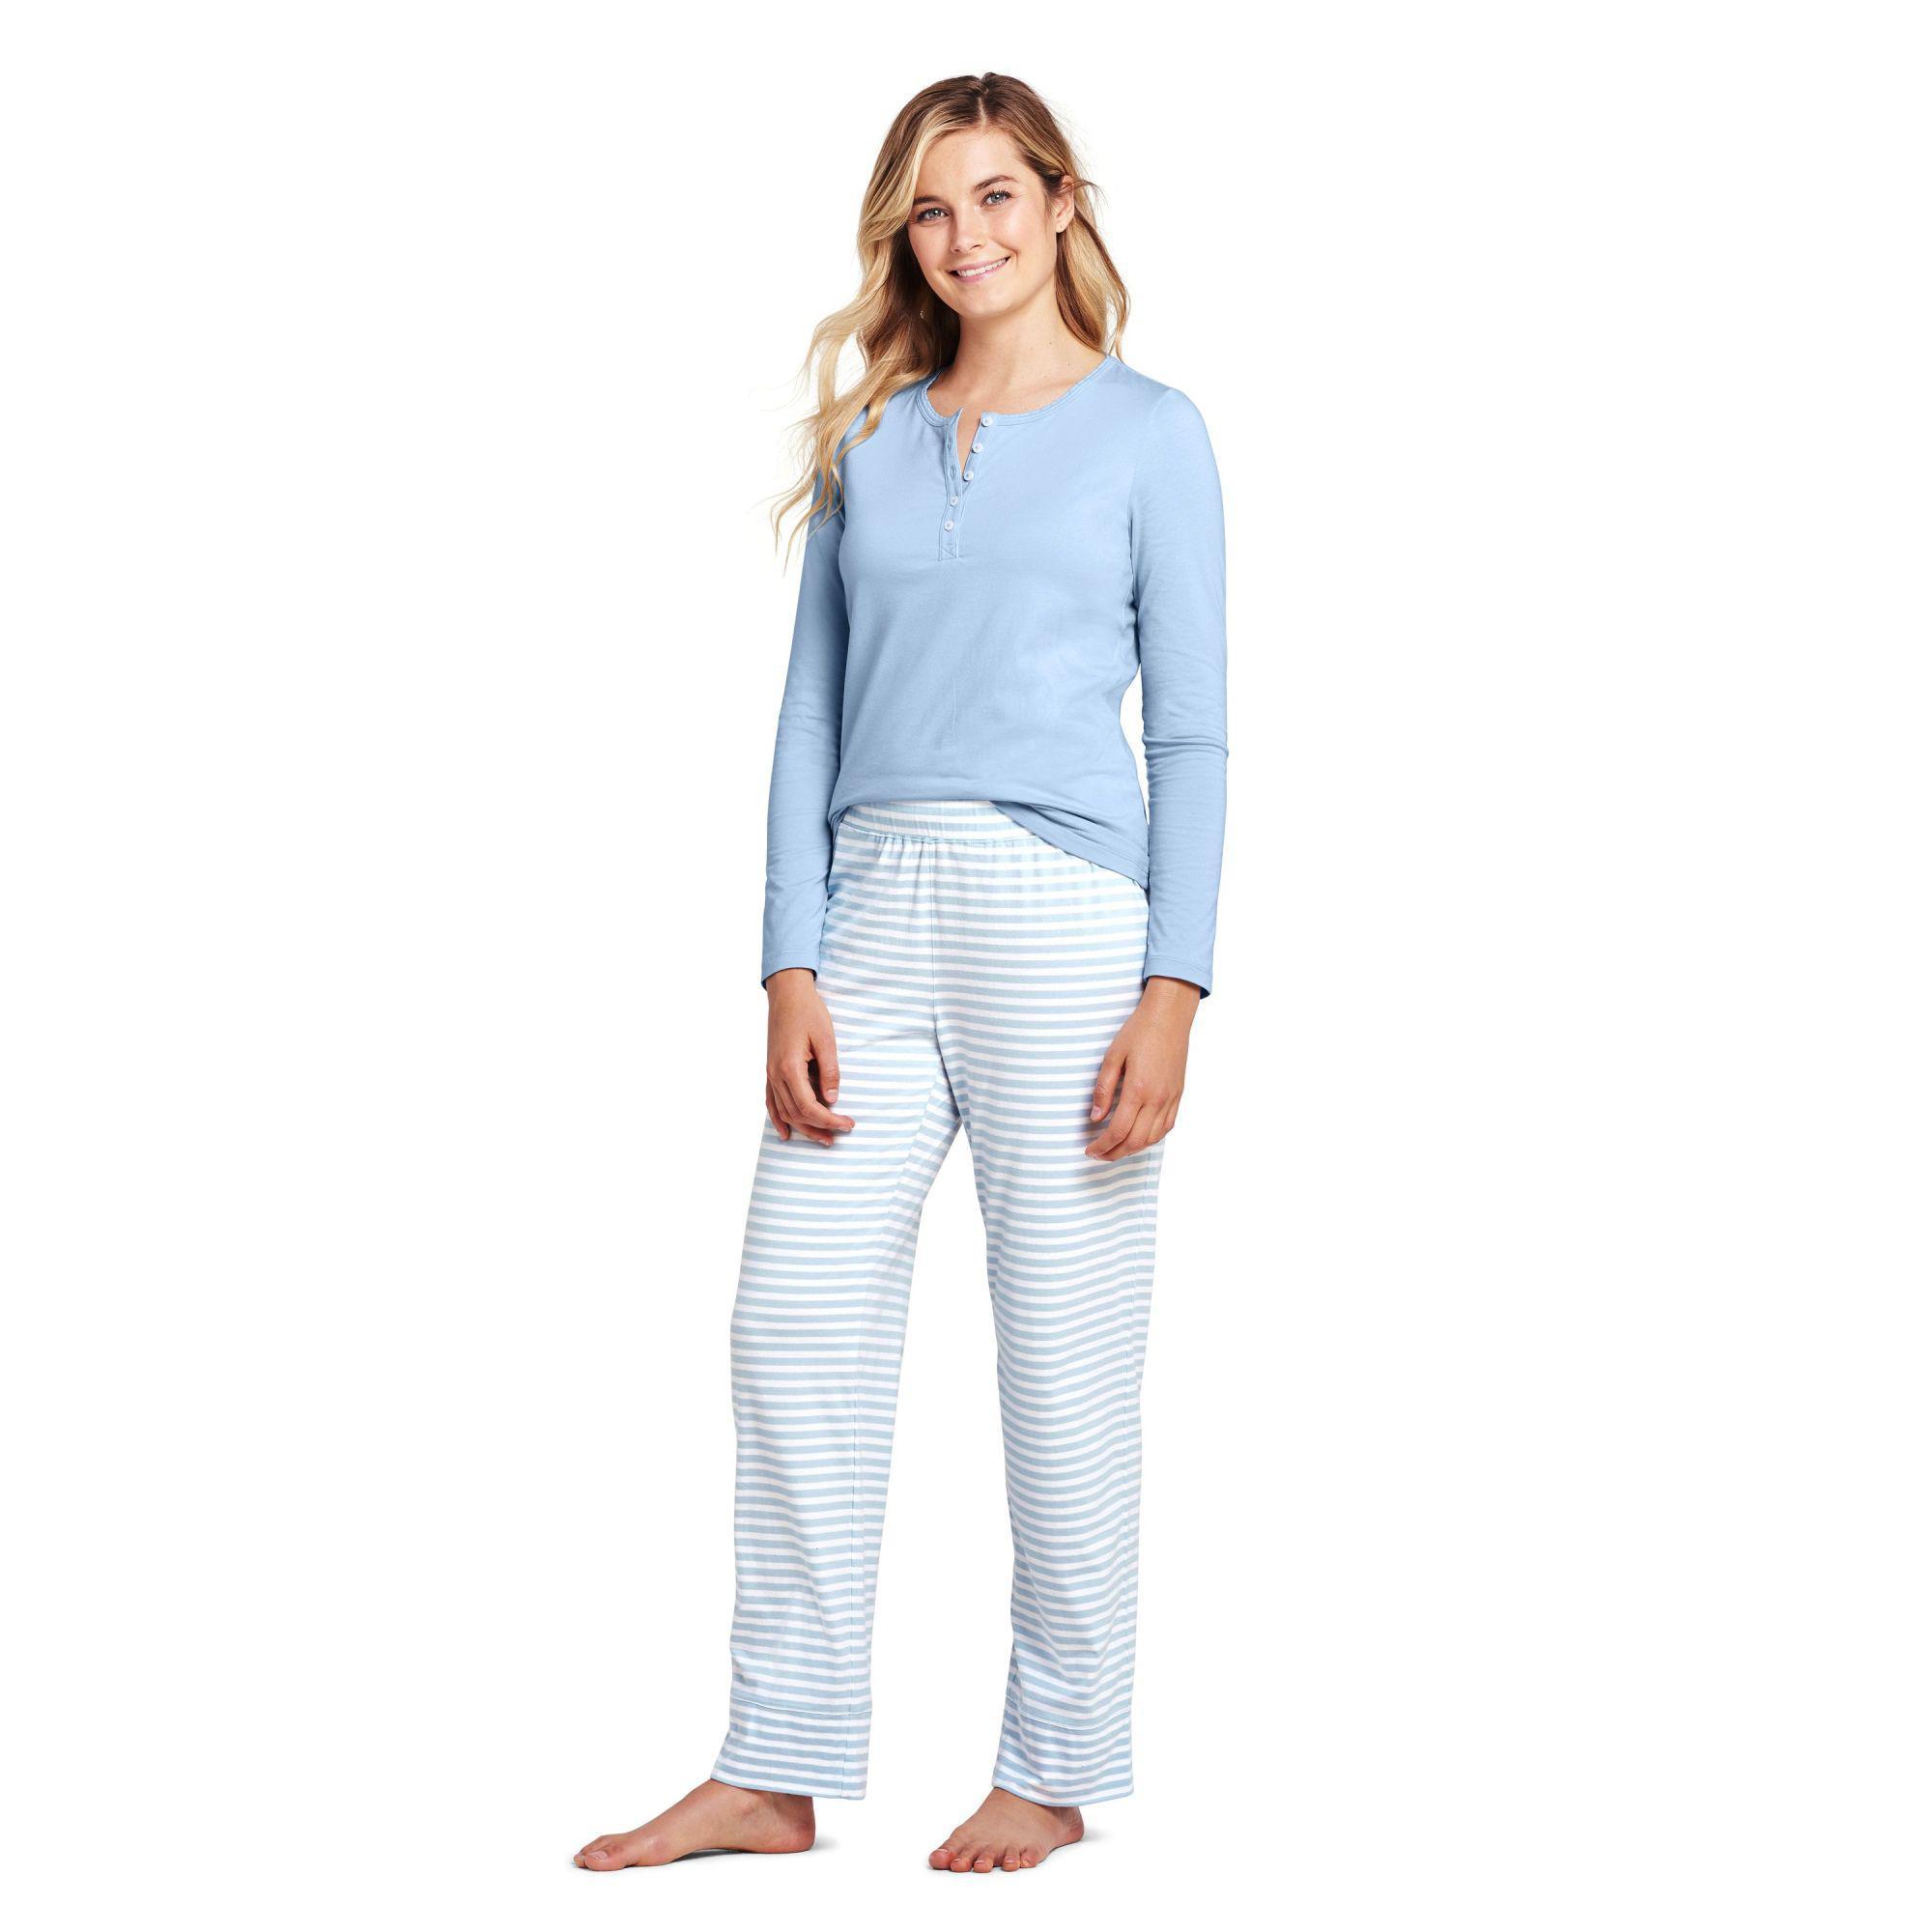 c4407fd24b Lands  End Blue Petite Patterned Cotton Modal Pyjama Set in Blue ...